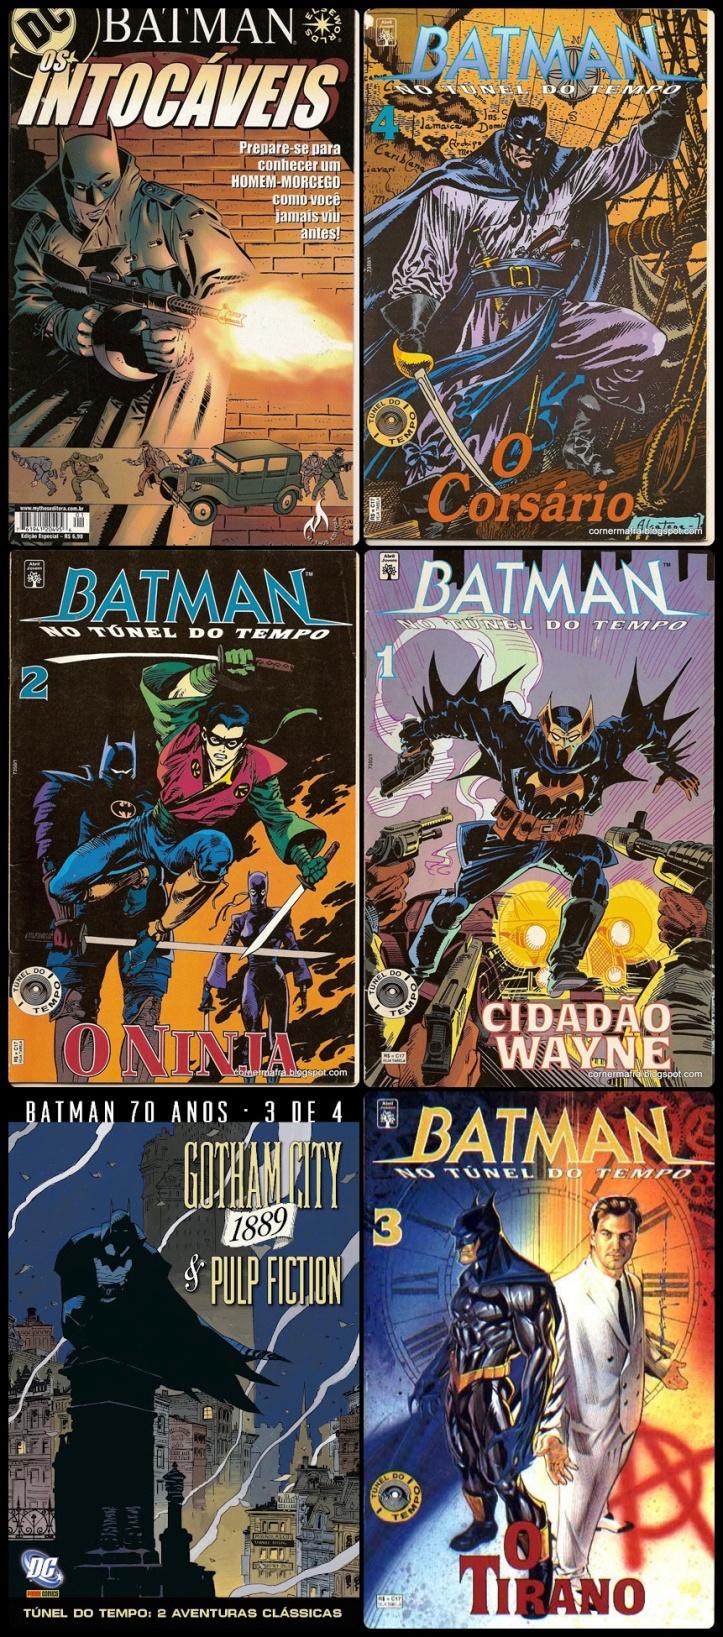 Batman - Túnel do Tempo